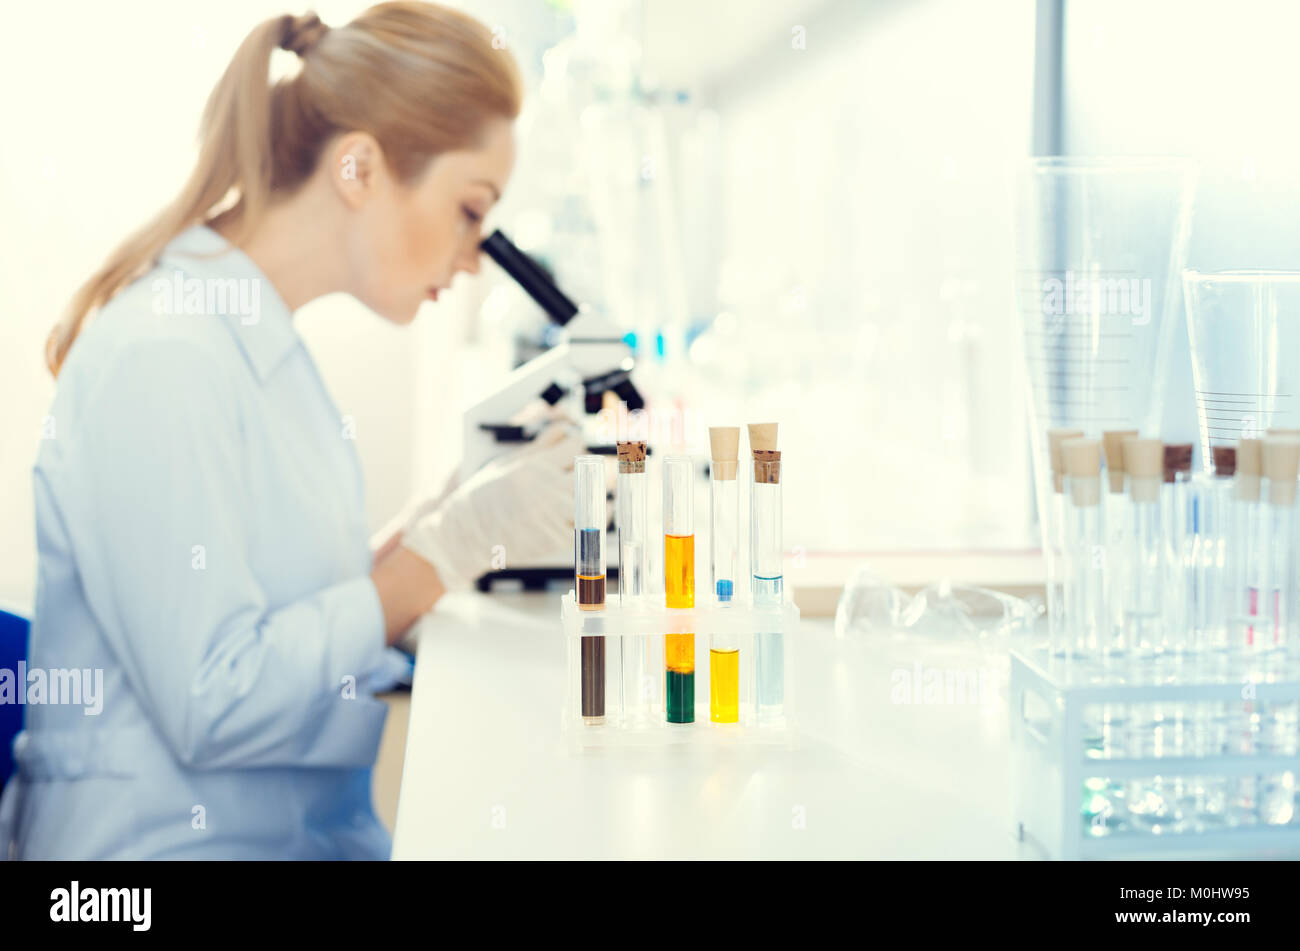 Female lab worker analyzing sample under microscope - Stock Image